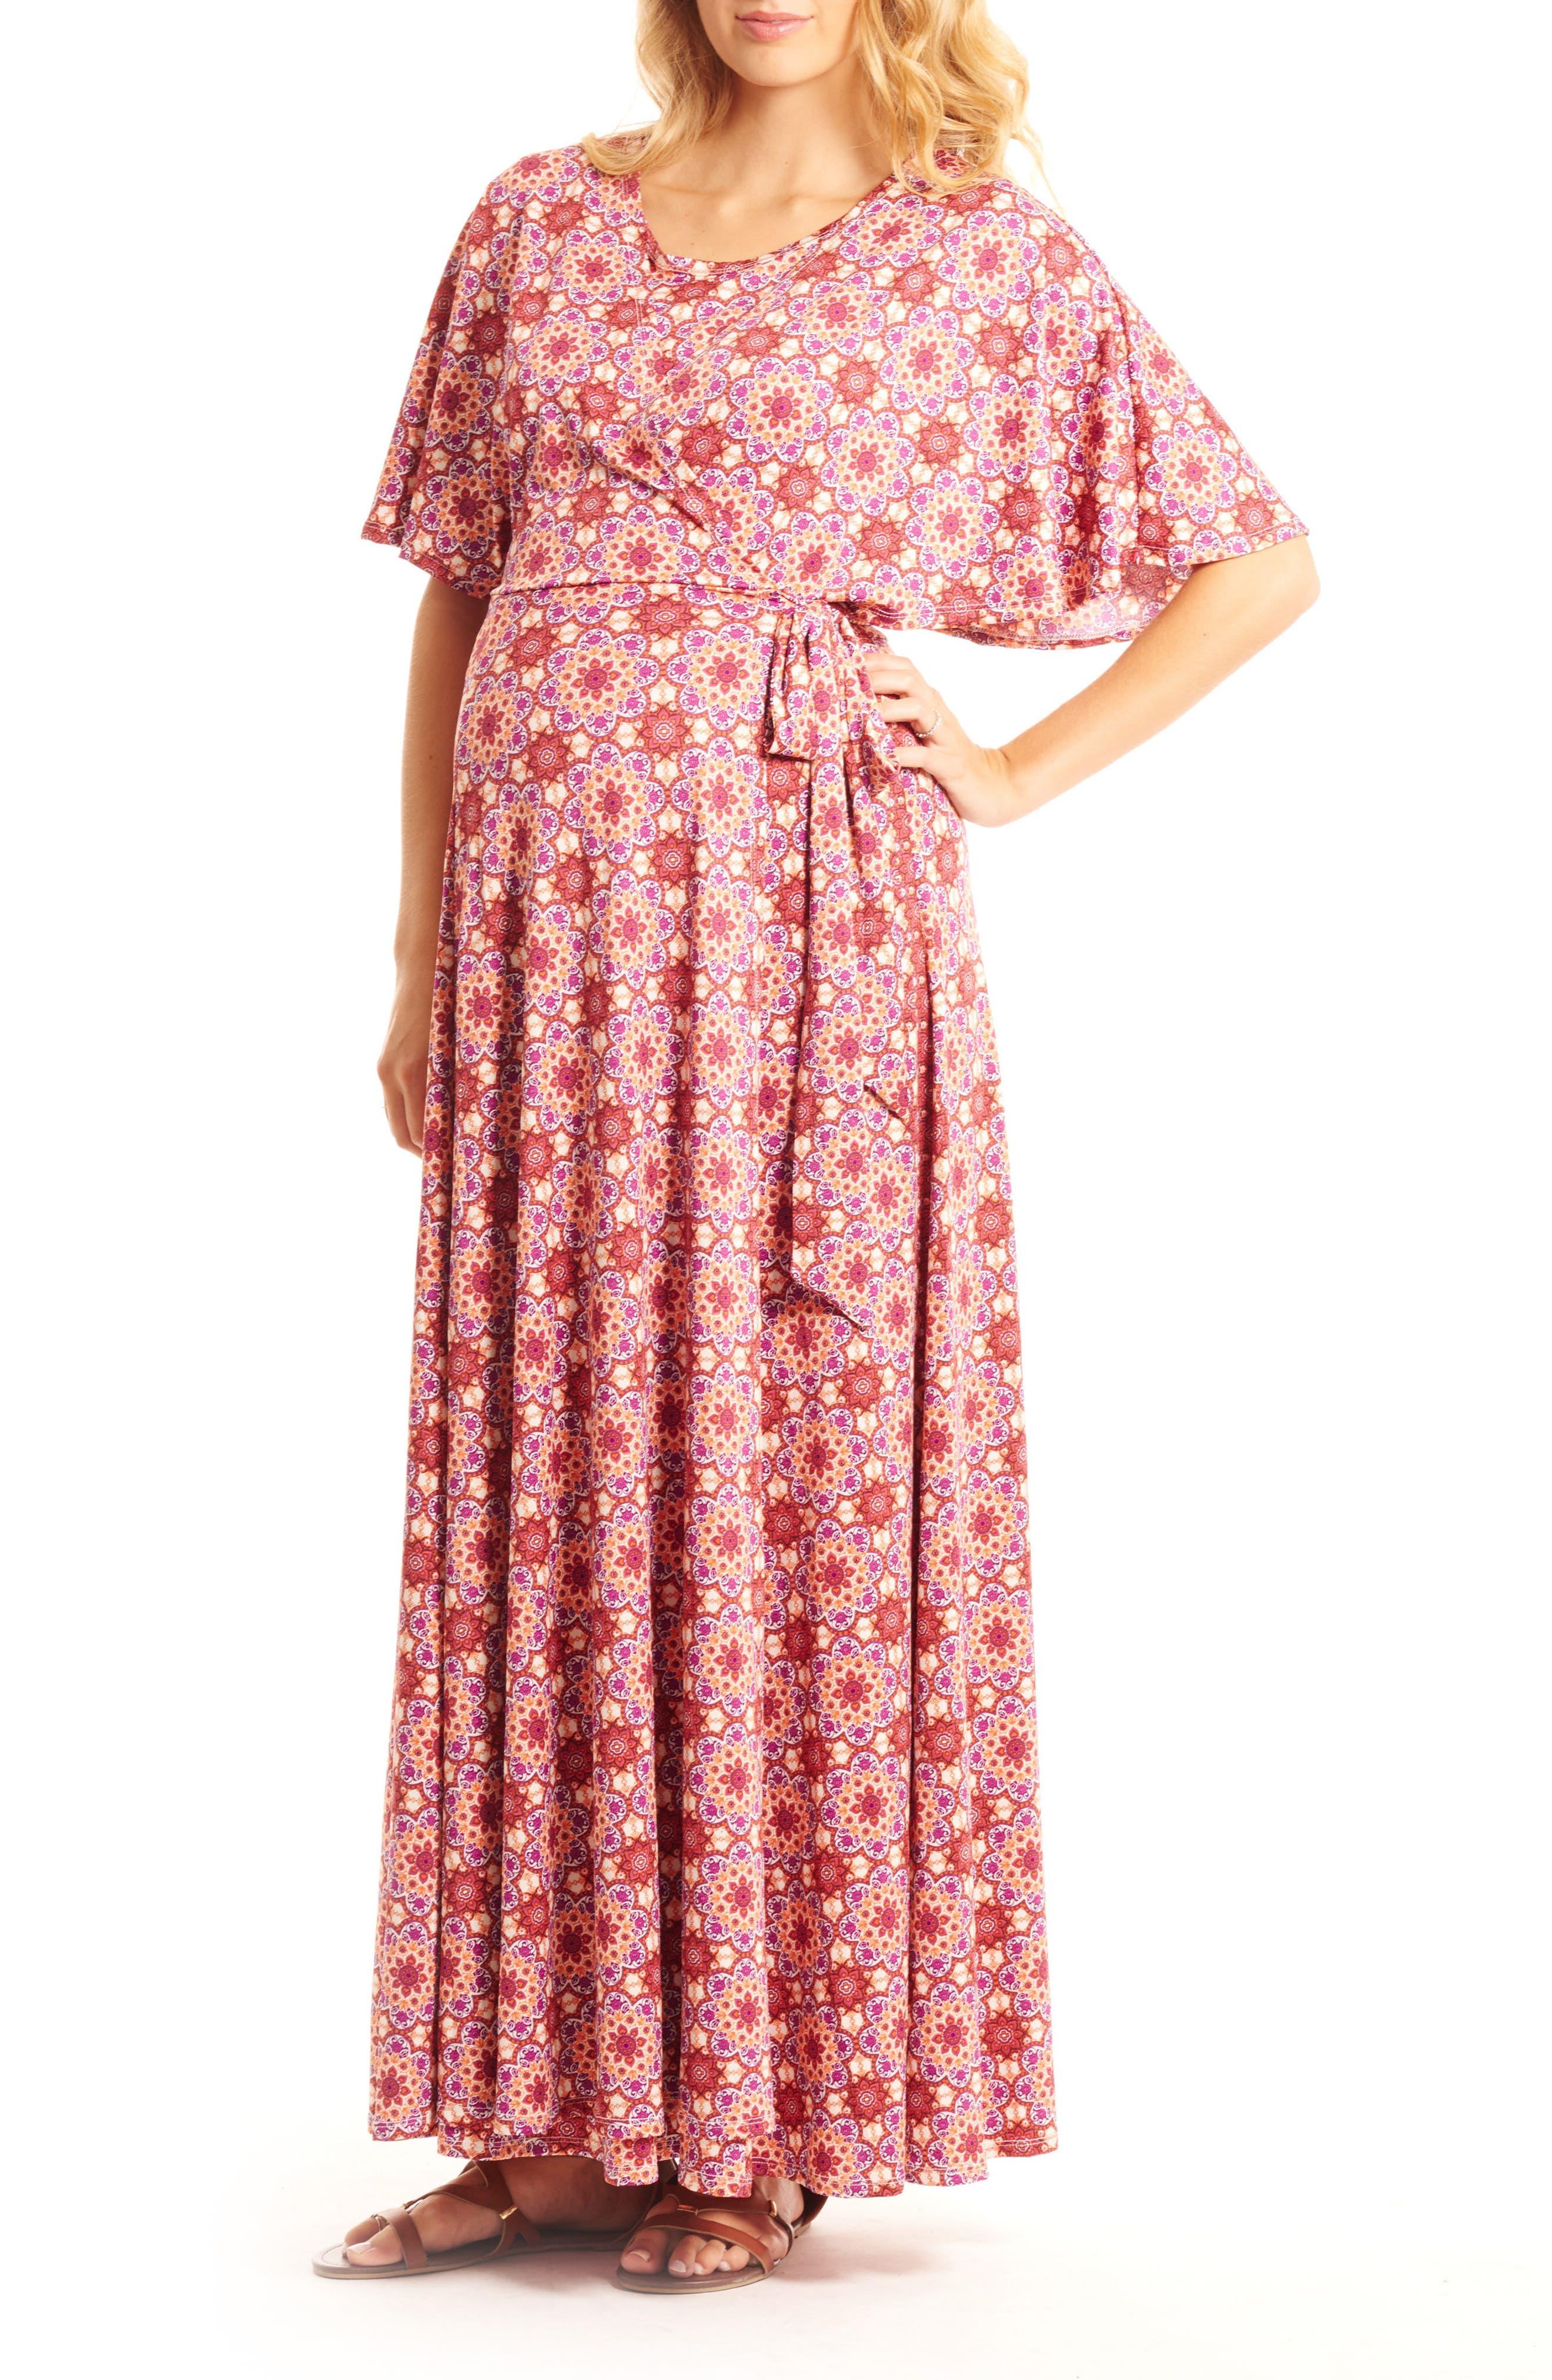 Asa Maternity/Nursing Maxi Wrap Dress,                             Main thumbnail 1, color,                             Sangria